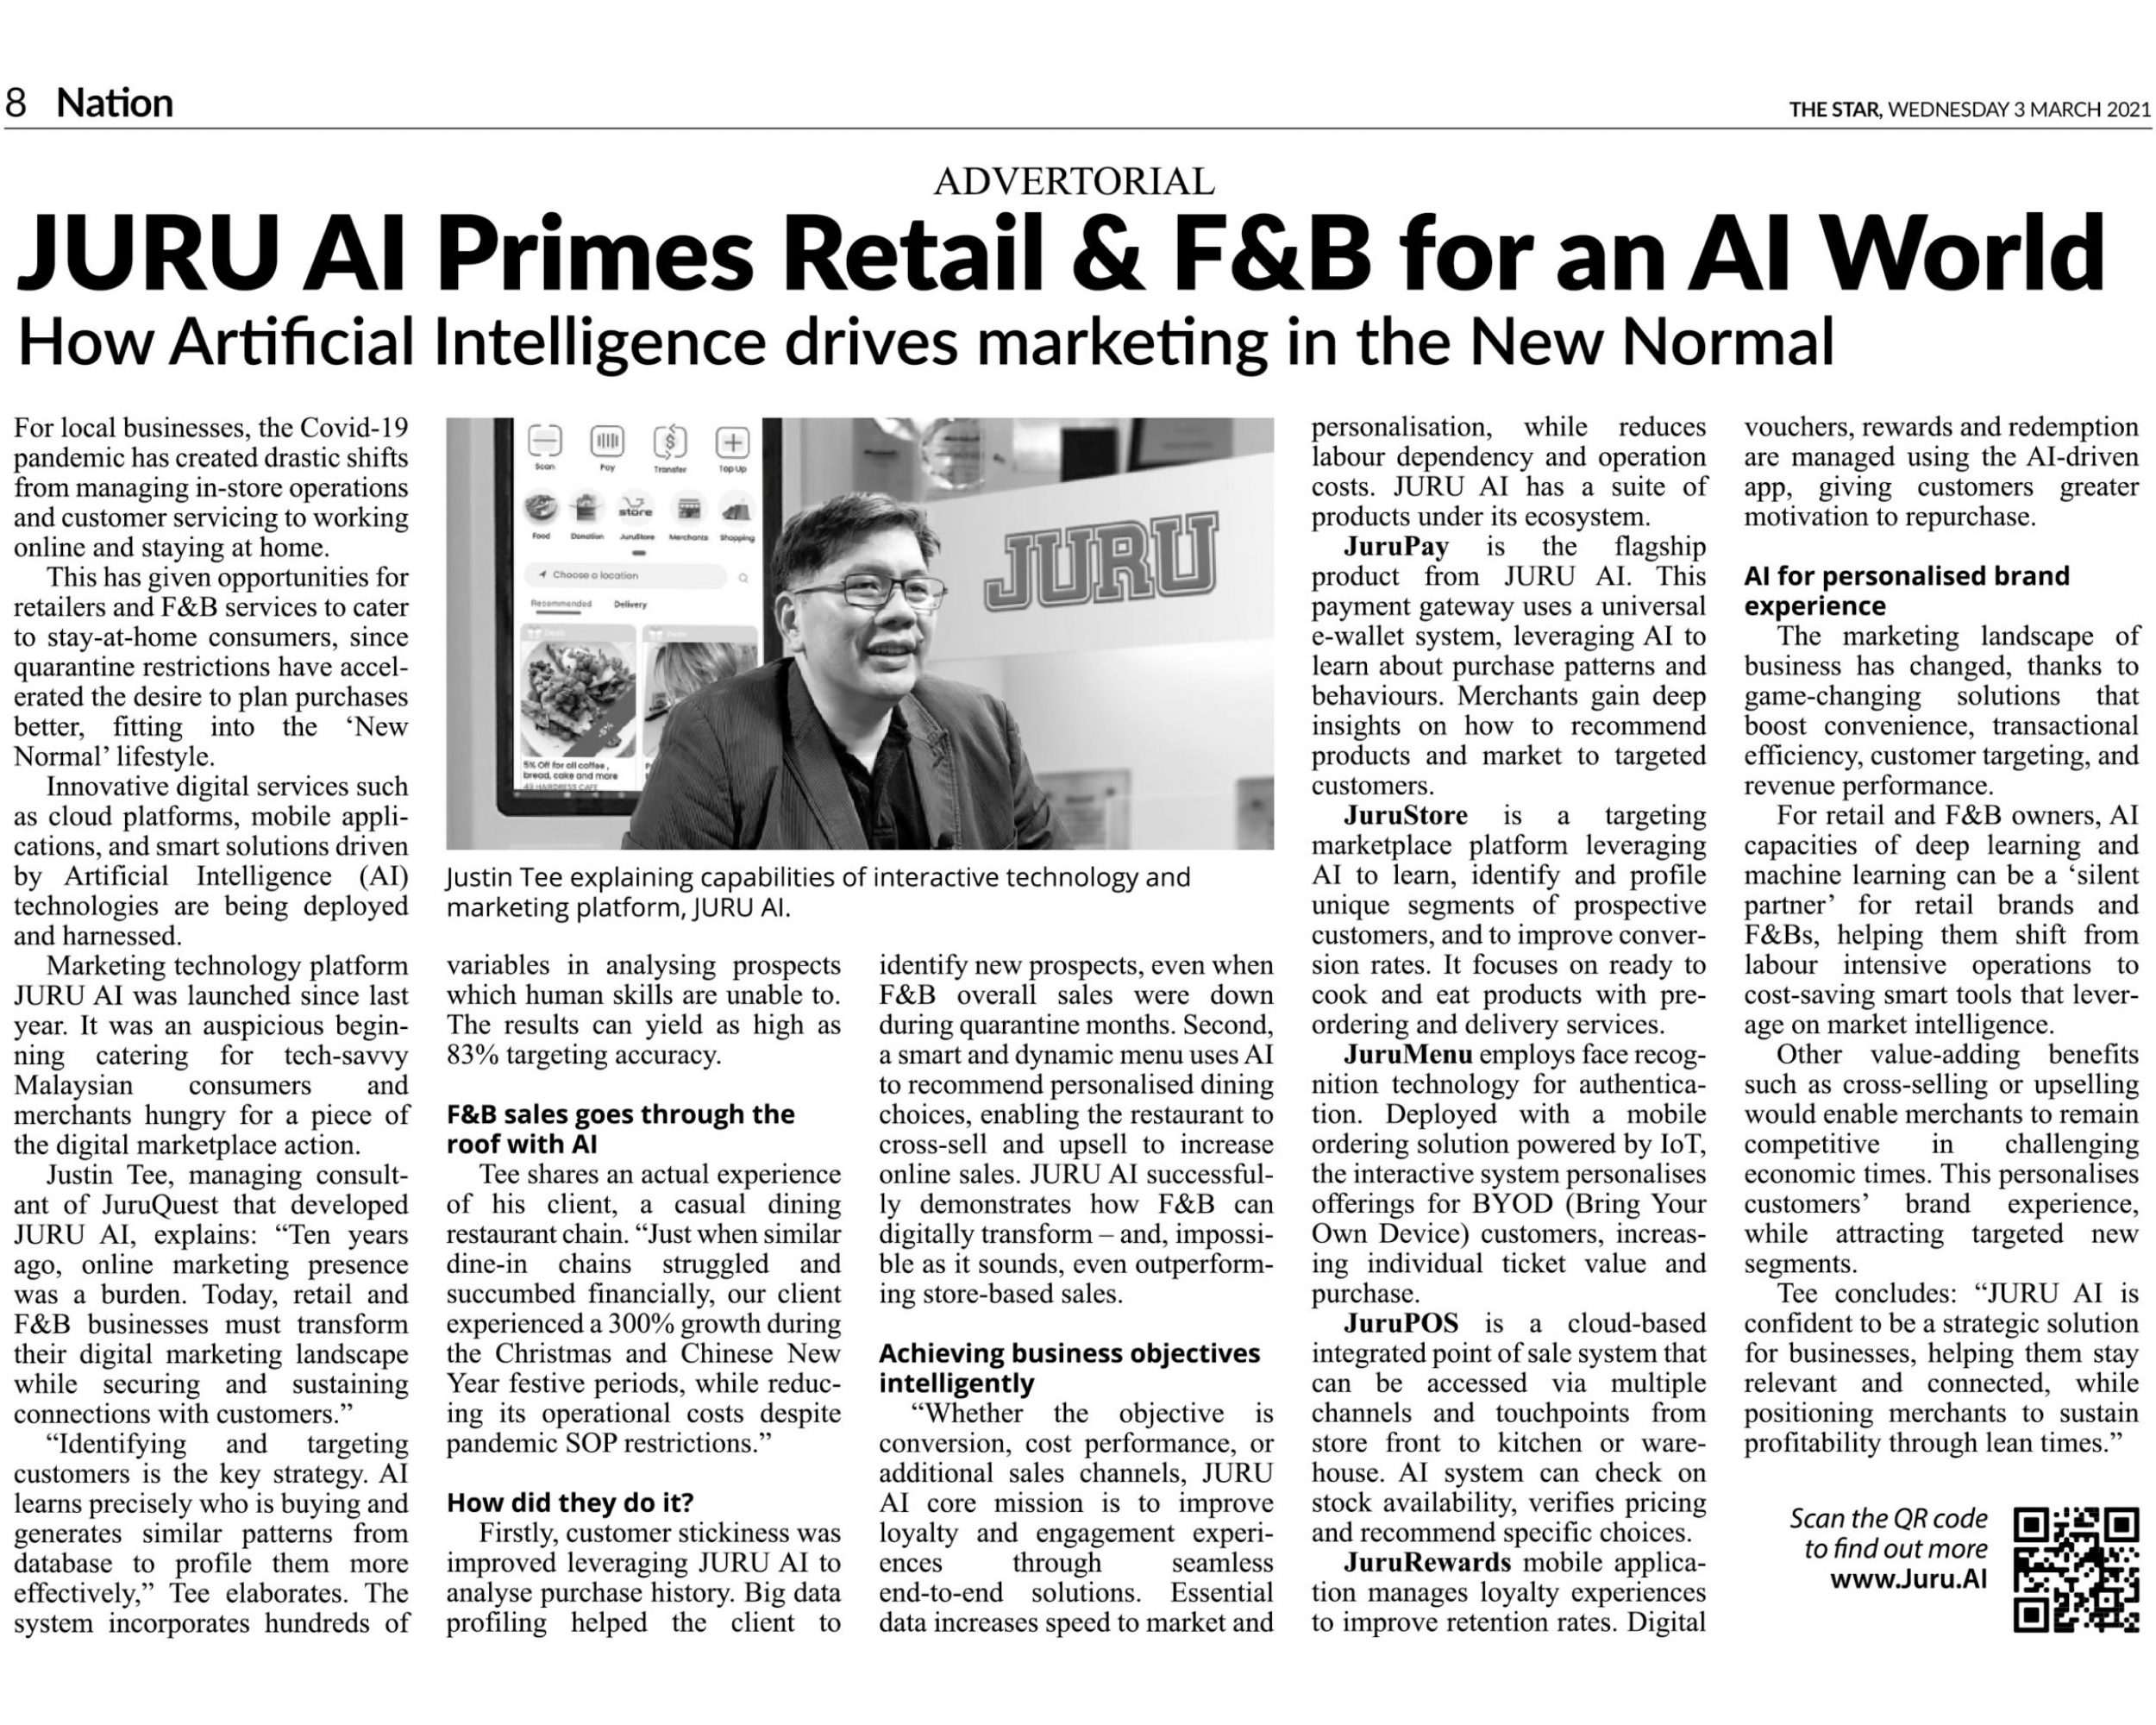 JuruAI in TheStar Newspaper on 3.3.2021